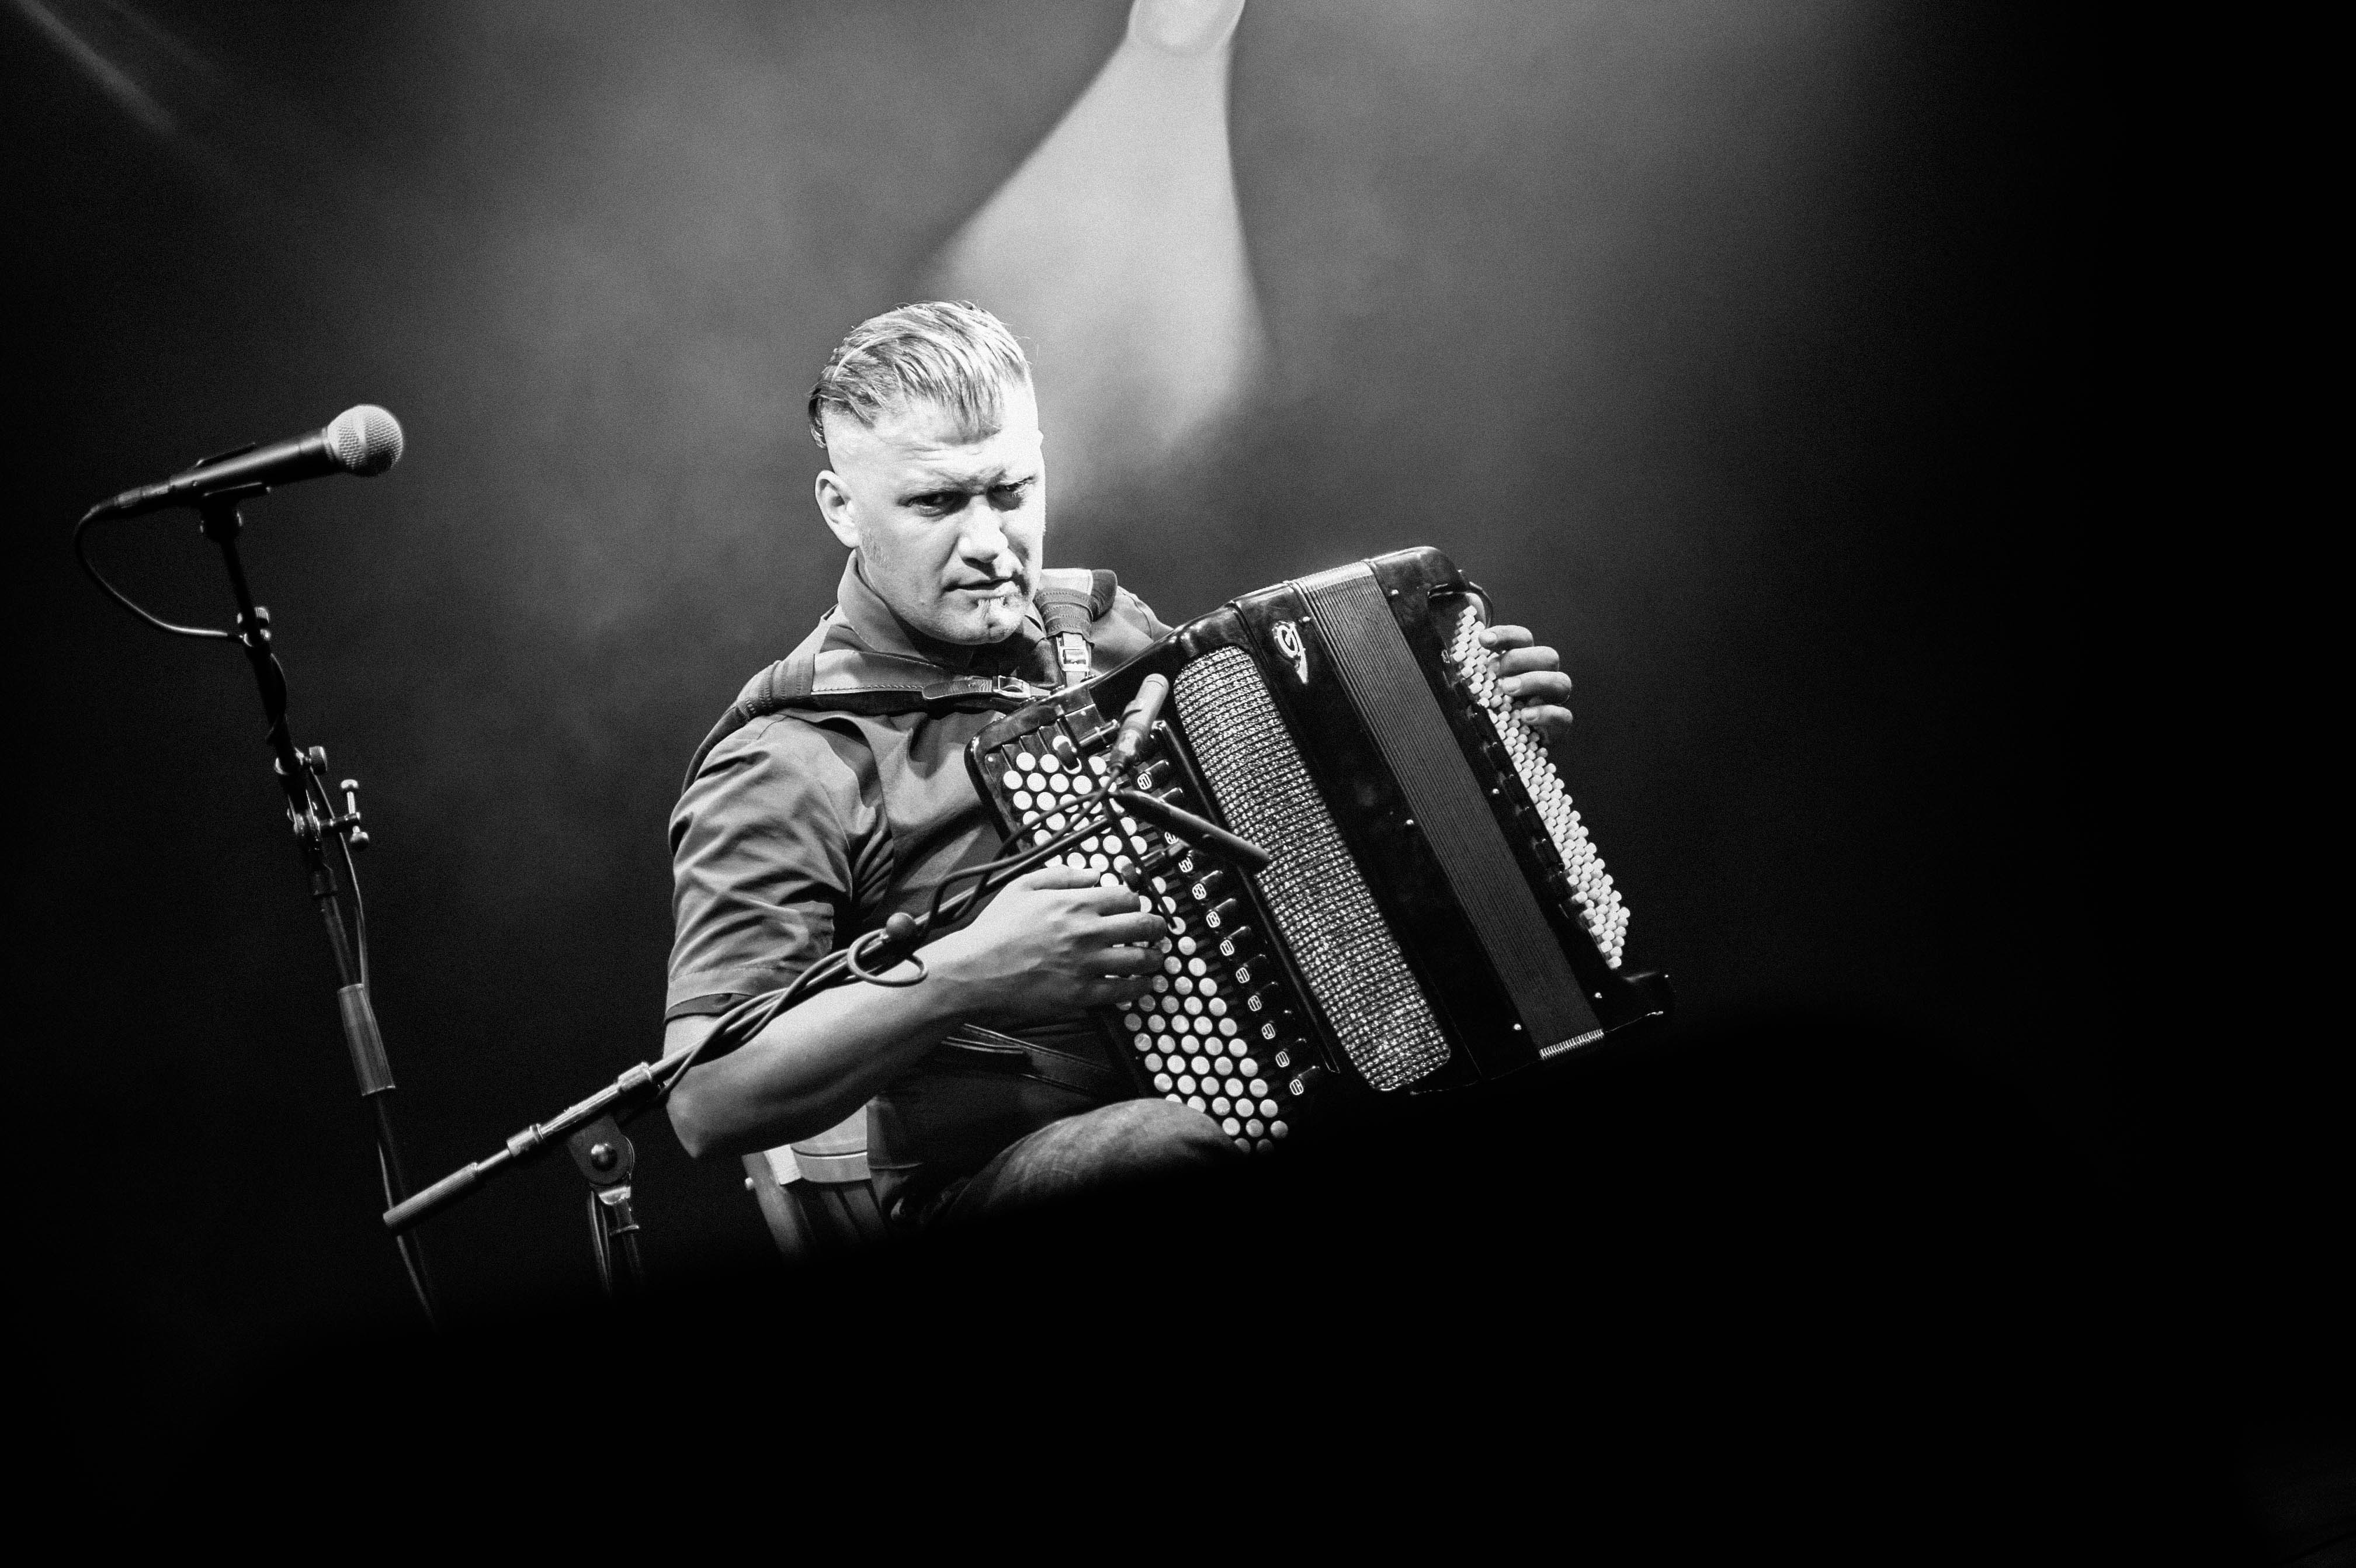 Mario Batkovic. (c) Marc Prodanovic